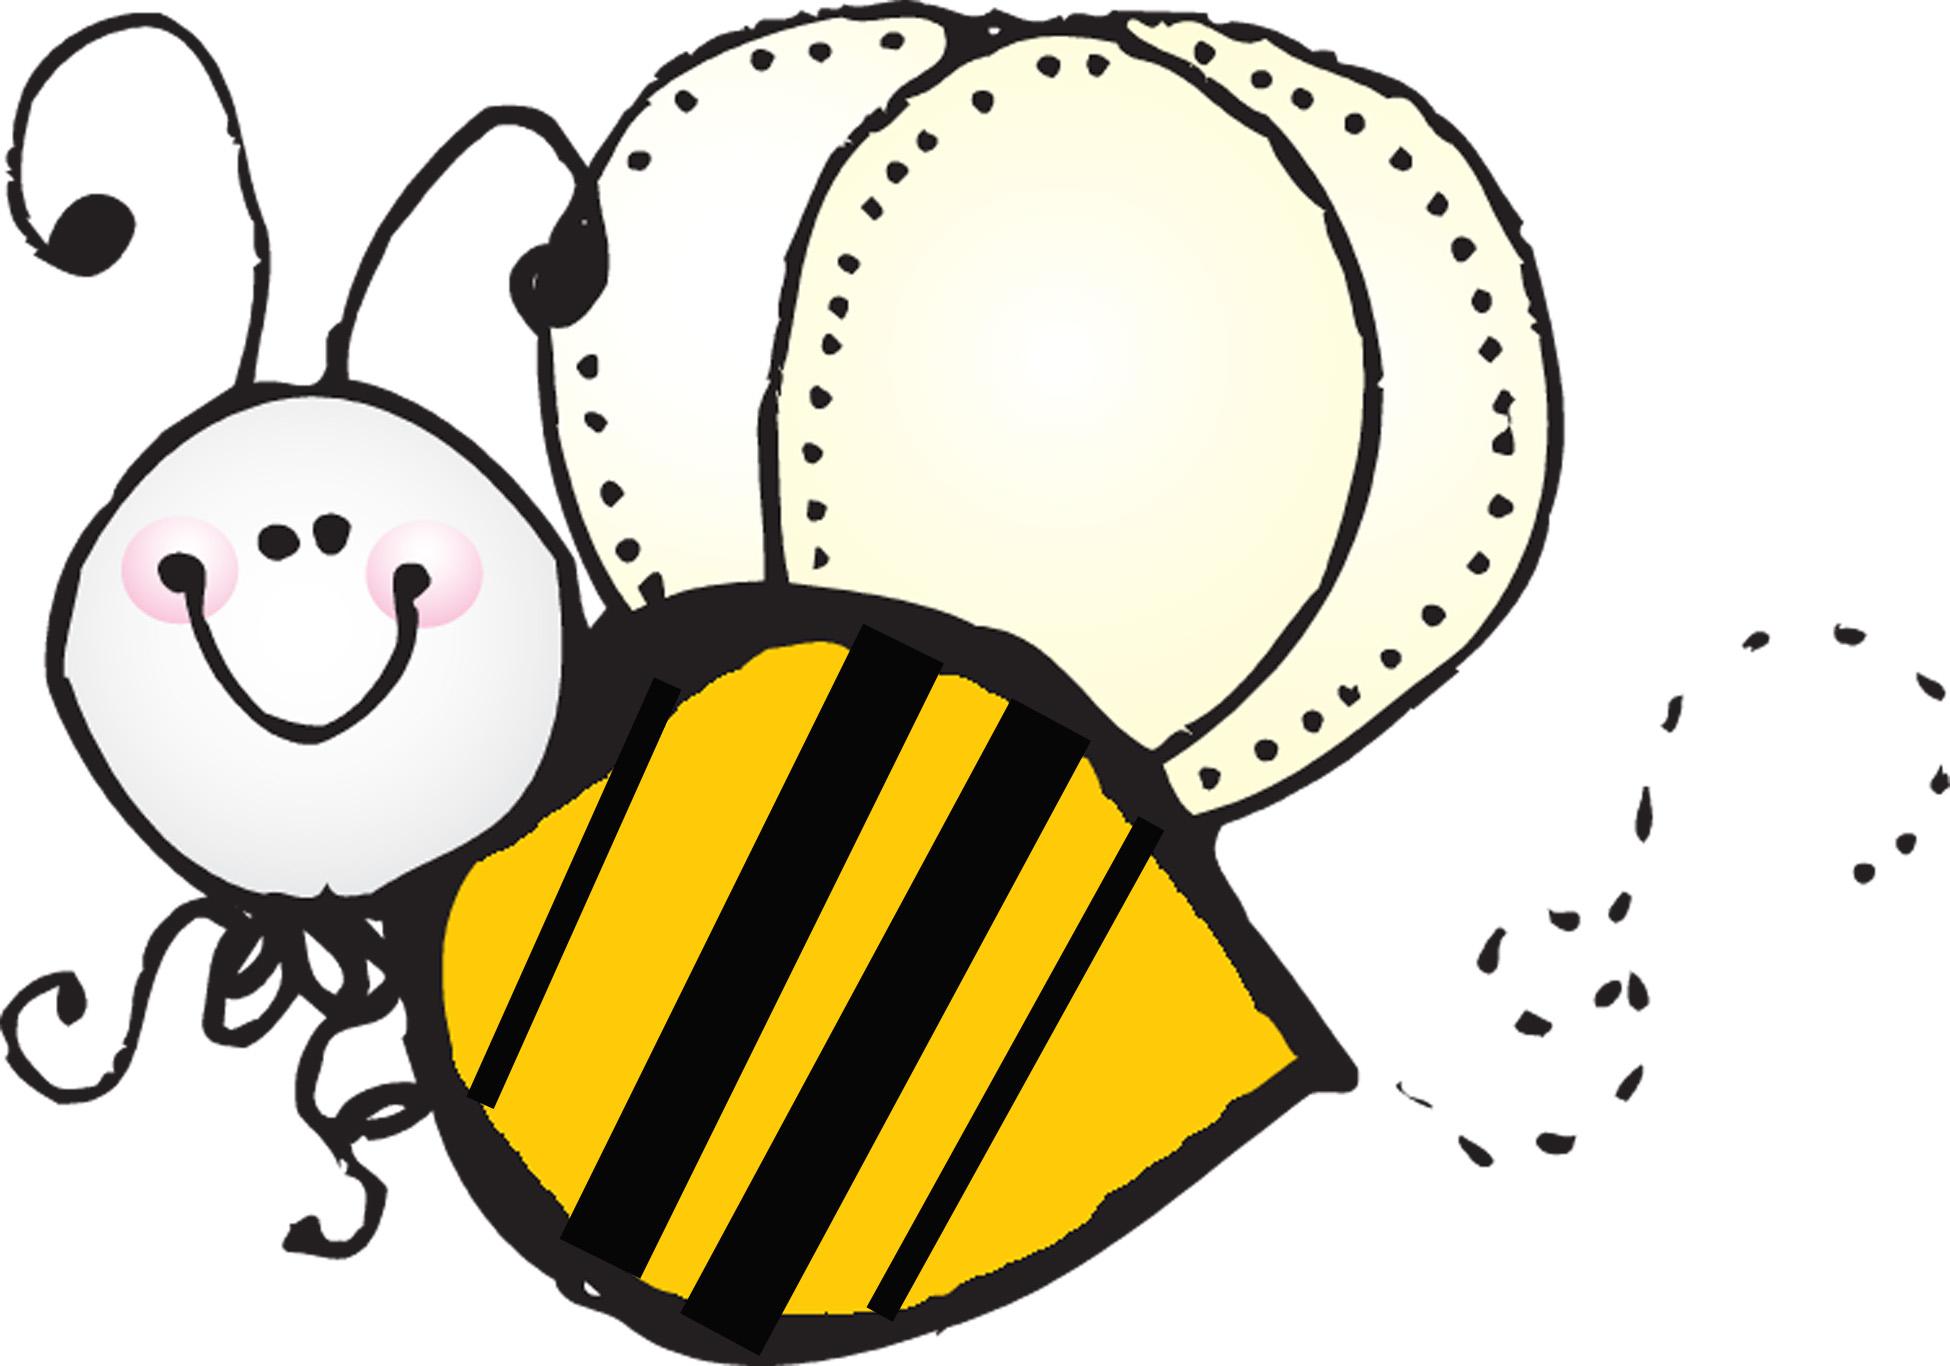 Cute bugs clip art. Bees clipart summer